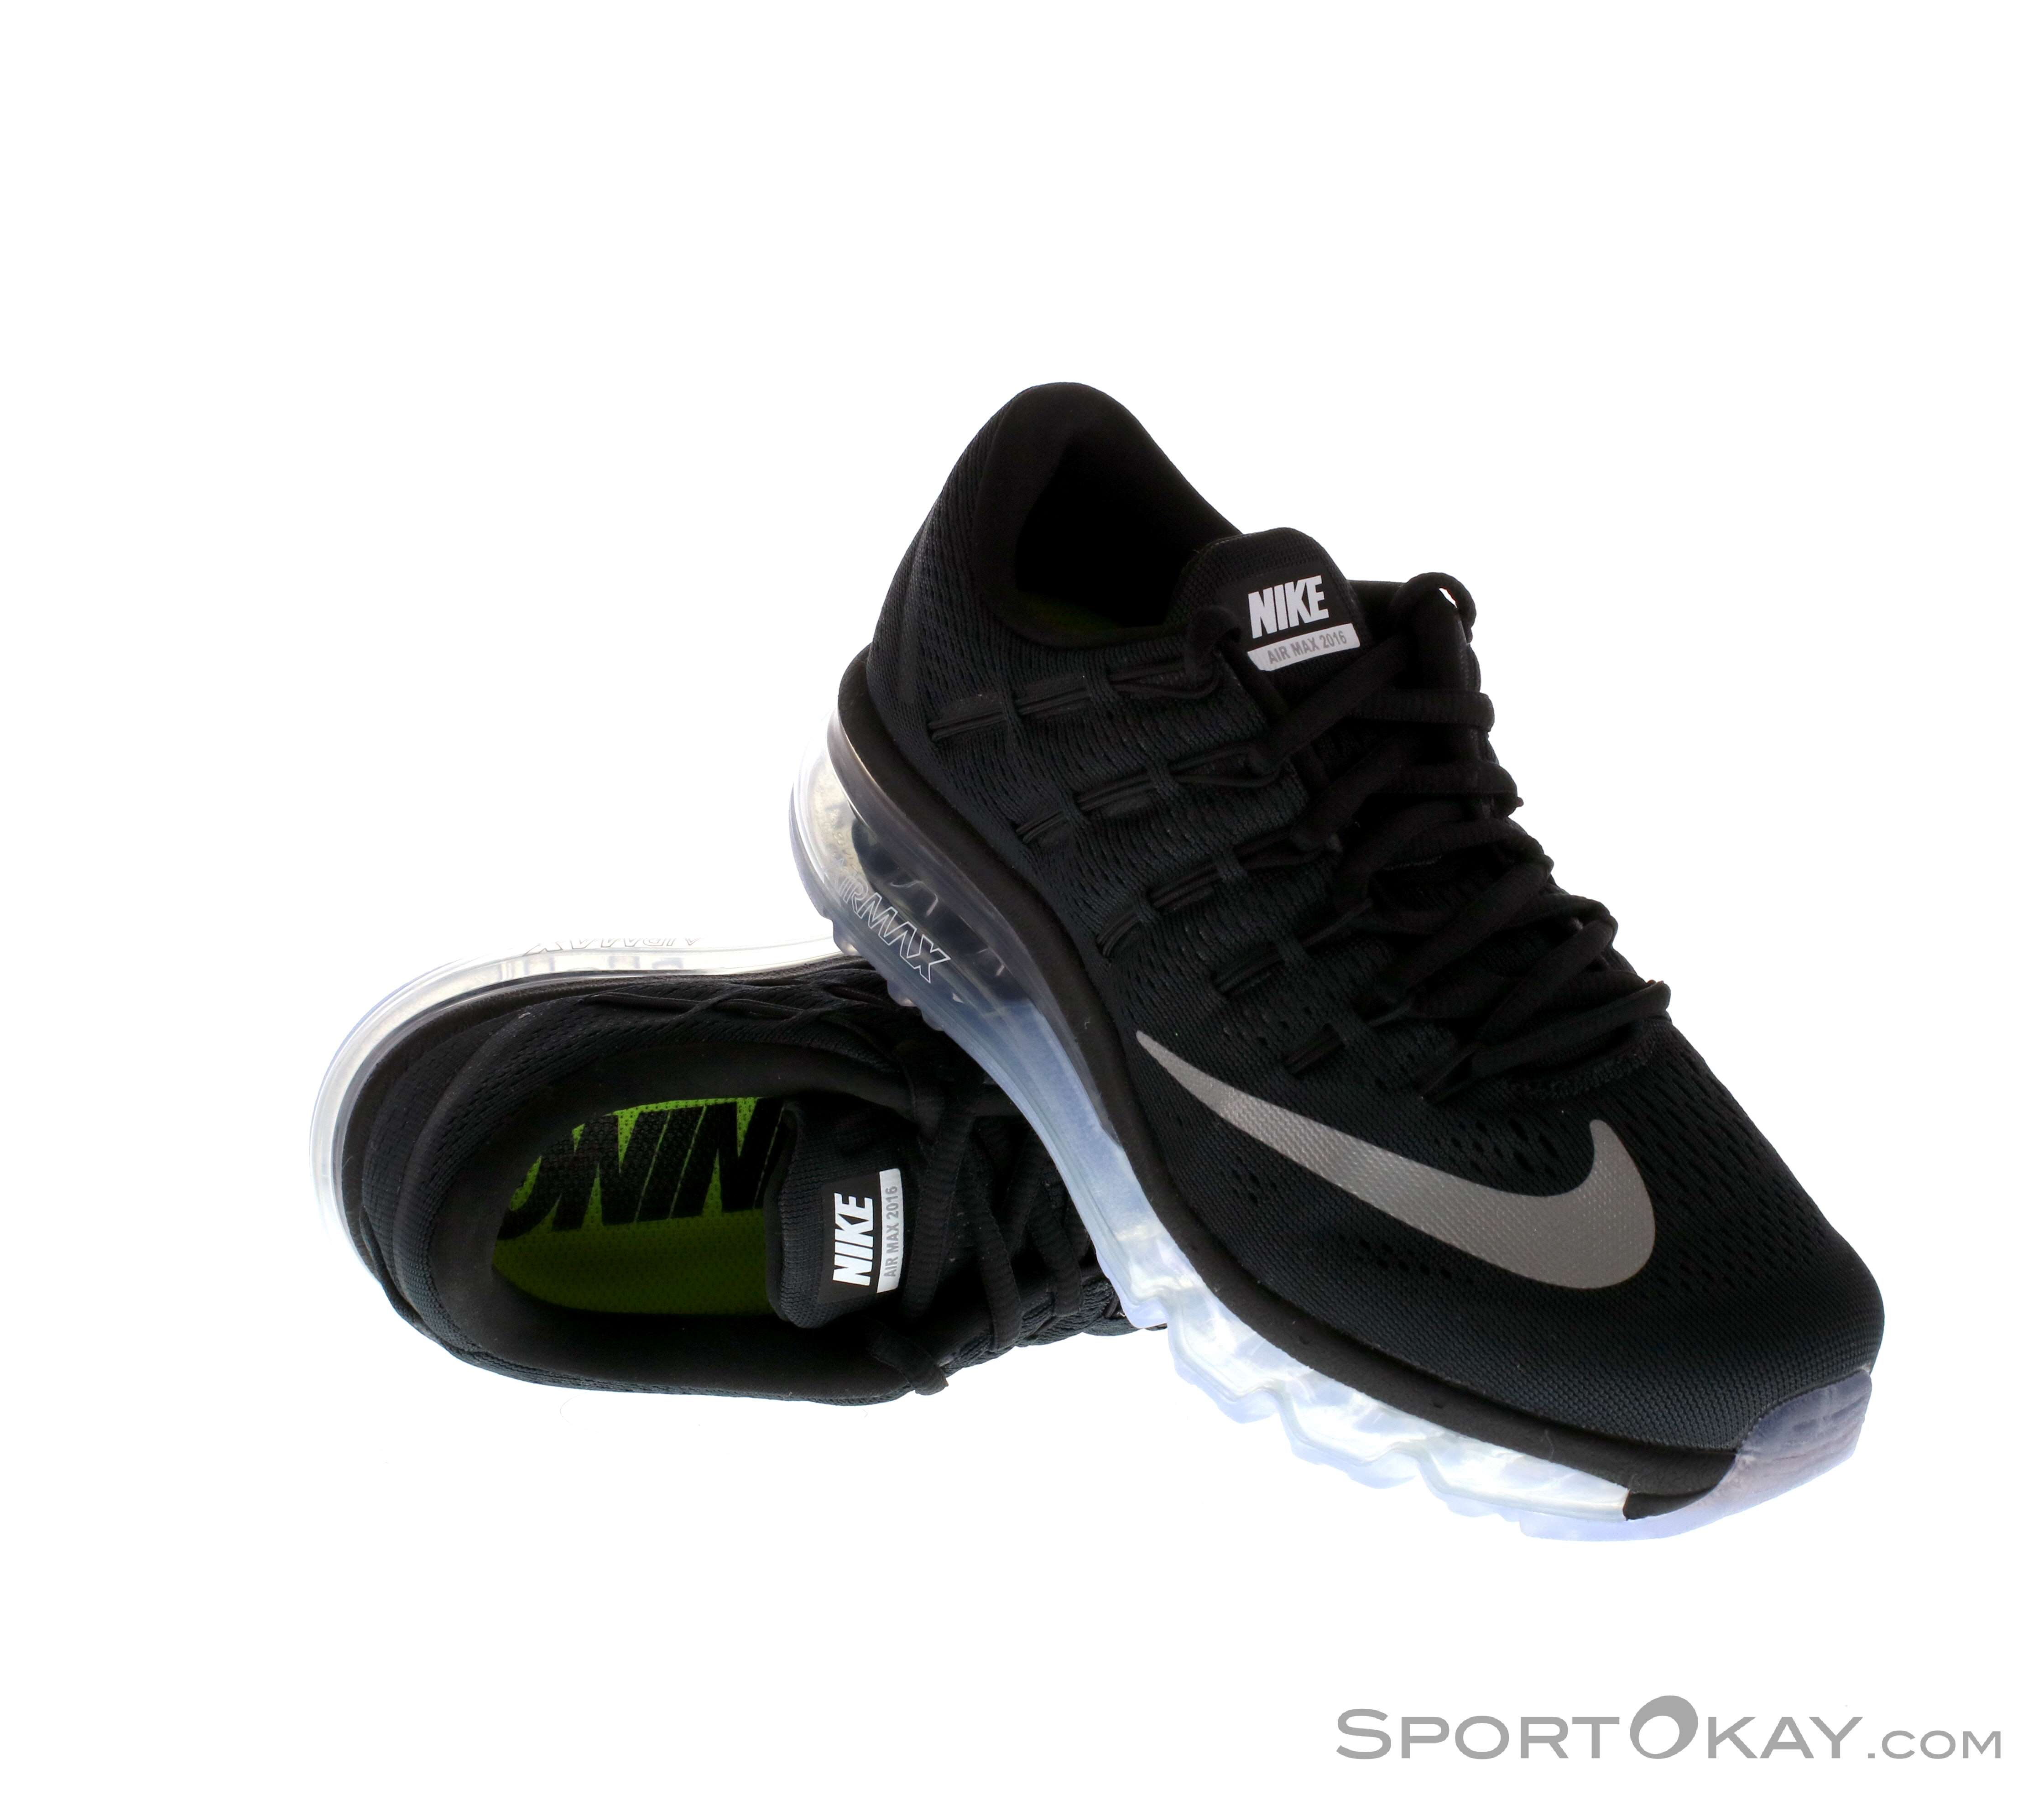 Nike Nike Air Max 2016 Damen Laufschuhe